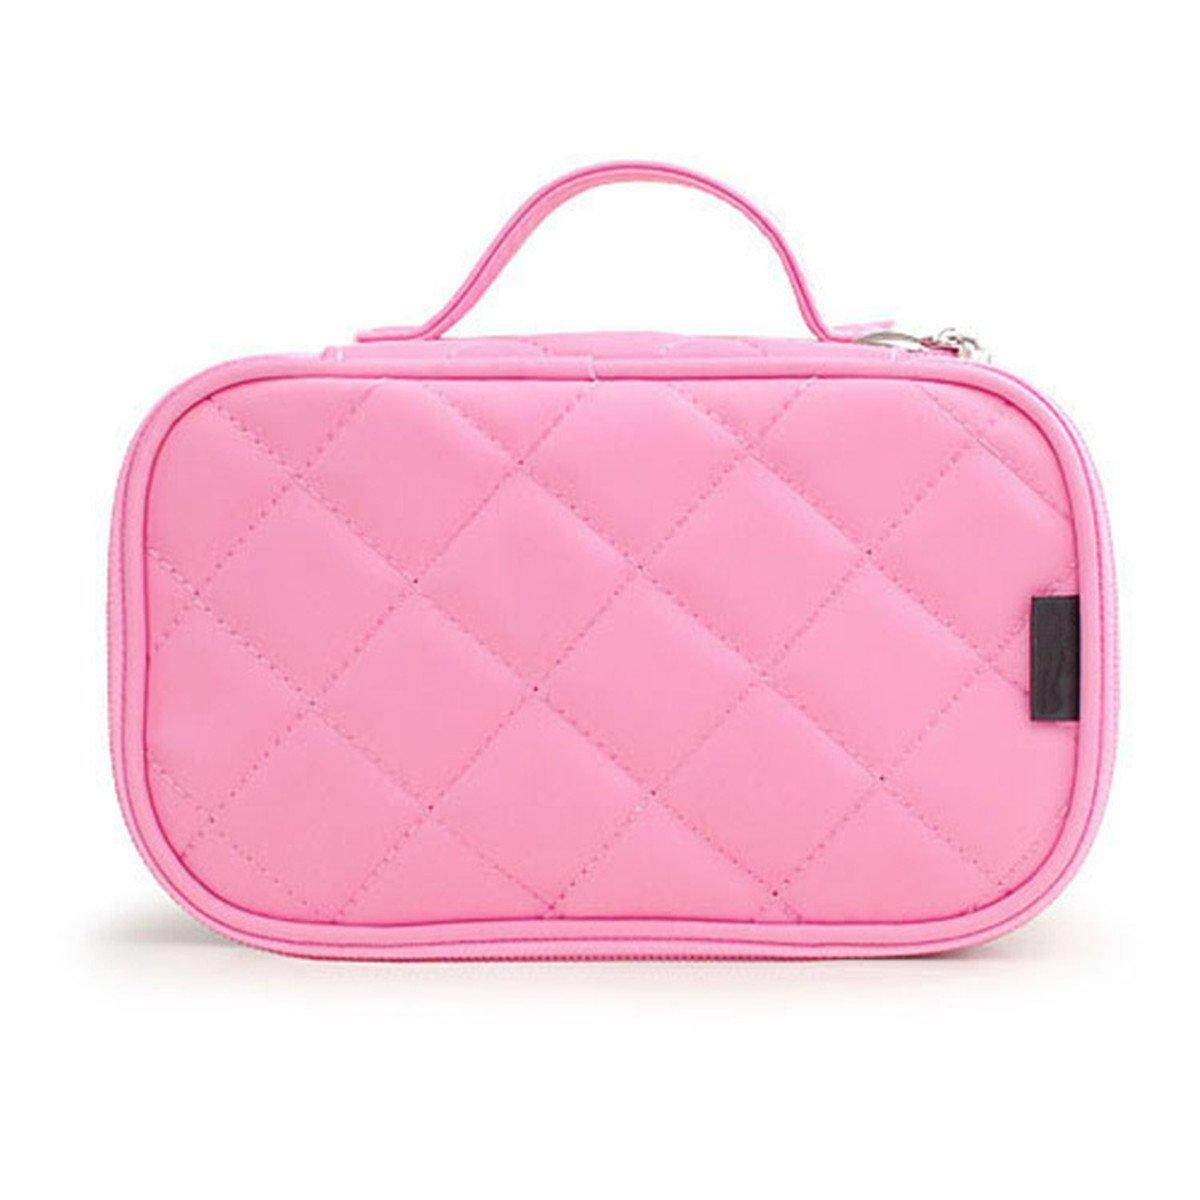 17d4c9c883b6 Honana HN-B63 Large Double Layers Travel Cosmetic Bag Portable Makeup  Organizer Toiletry Storage Bag